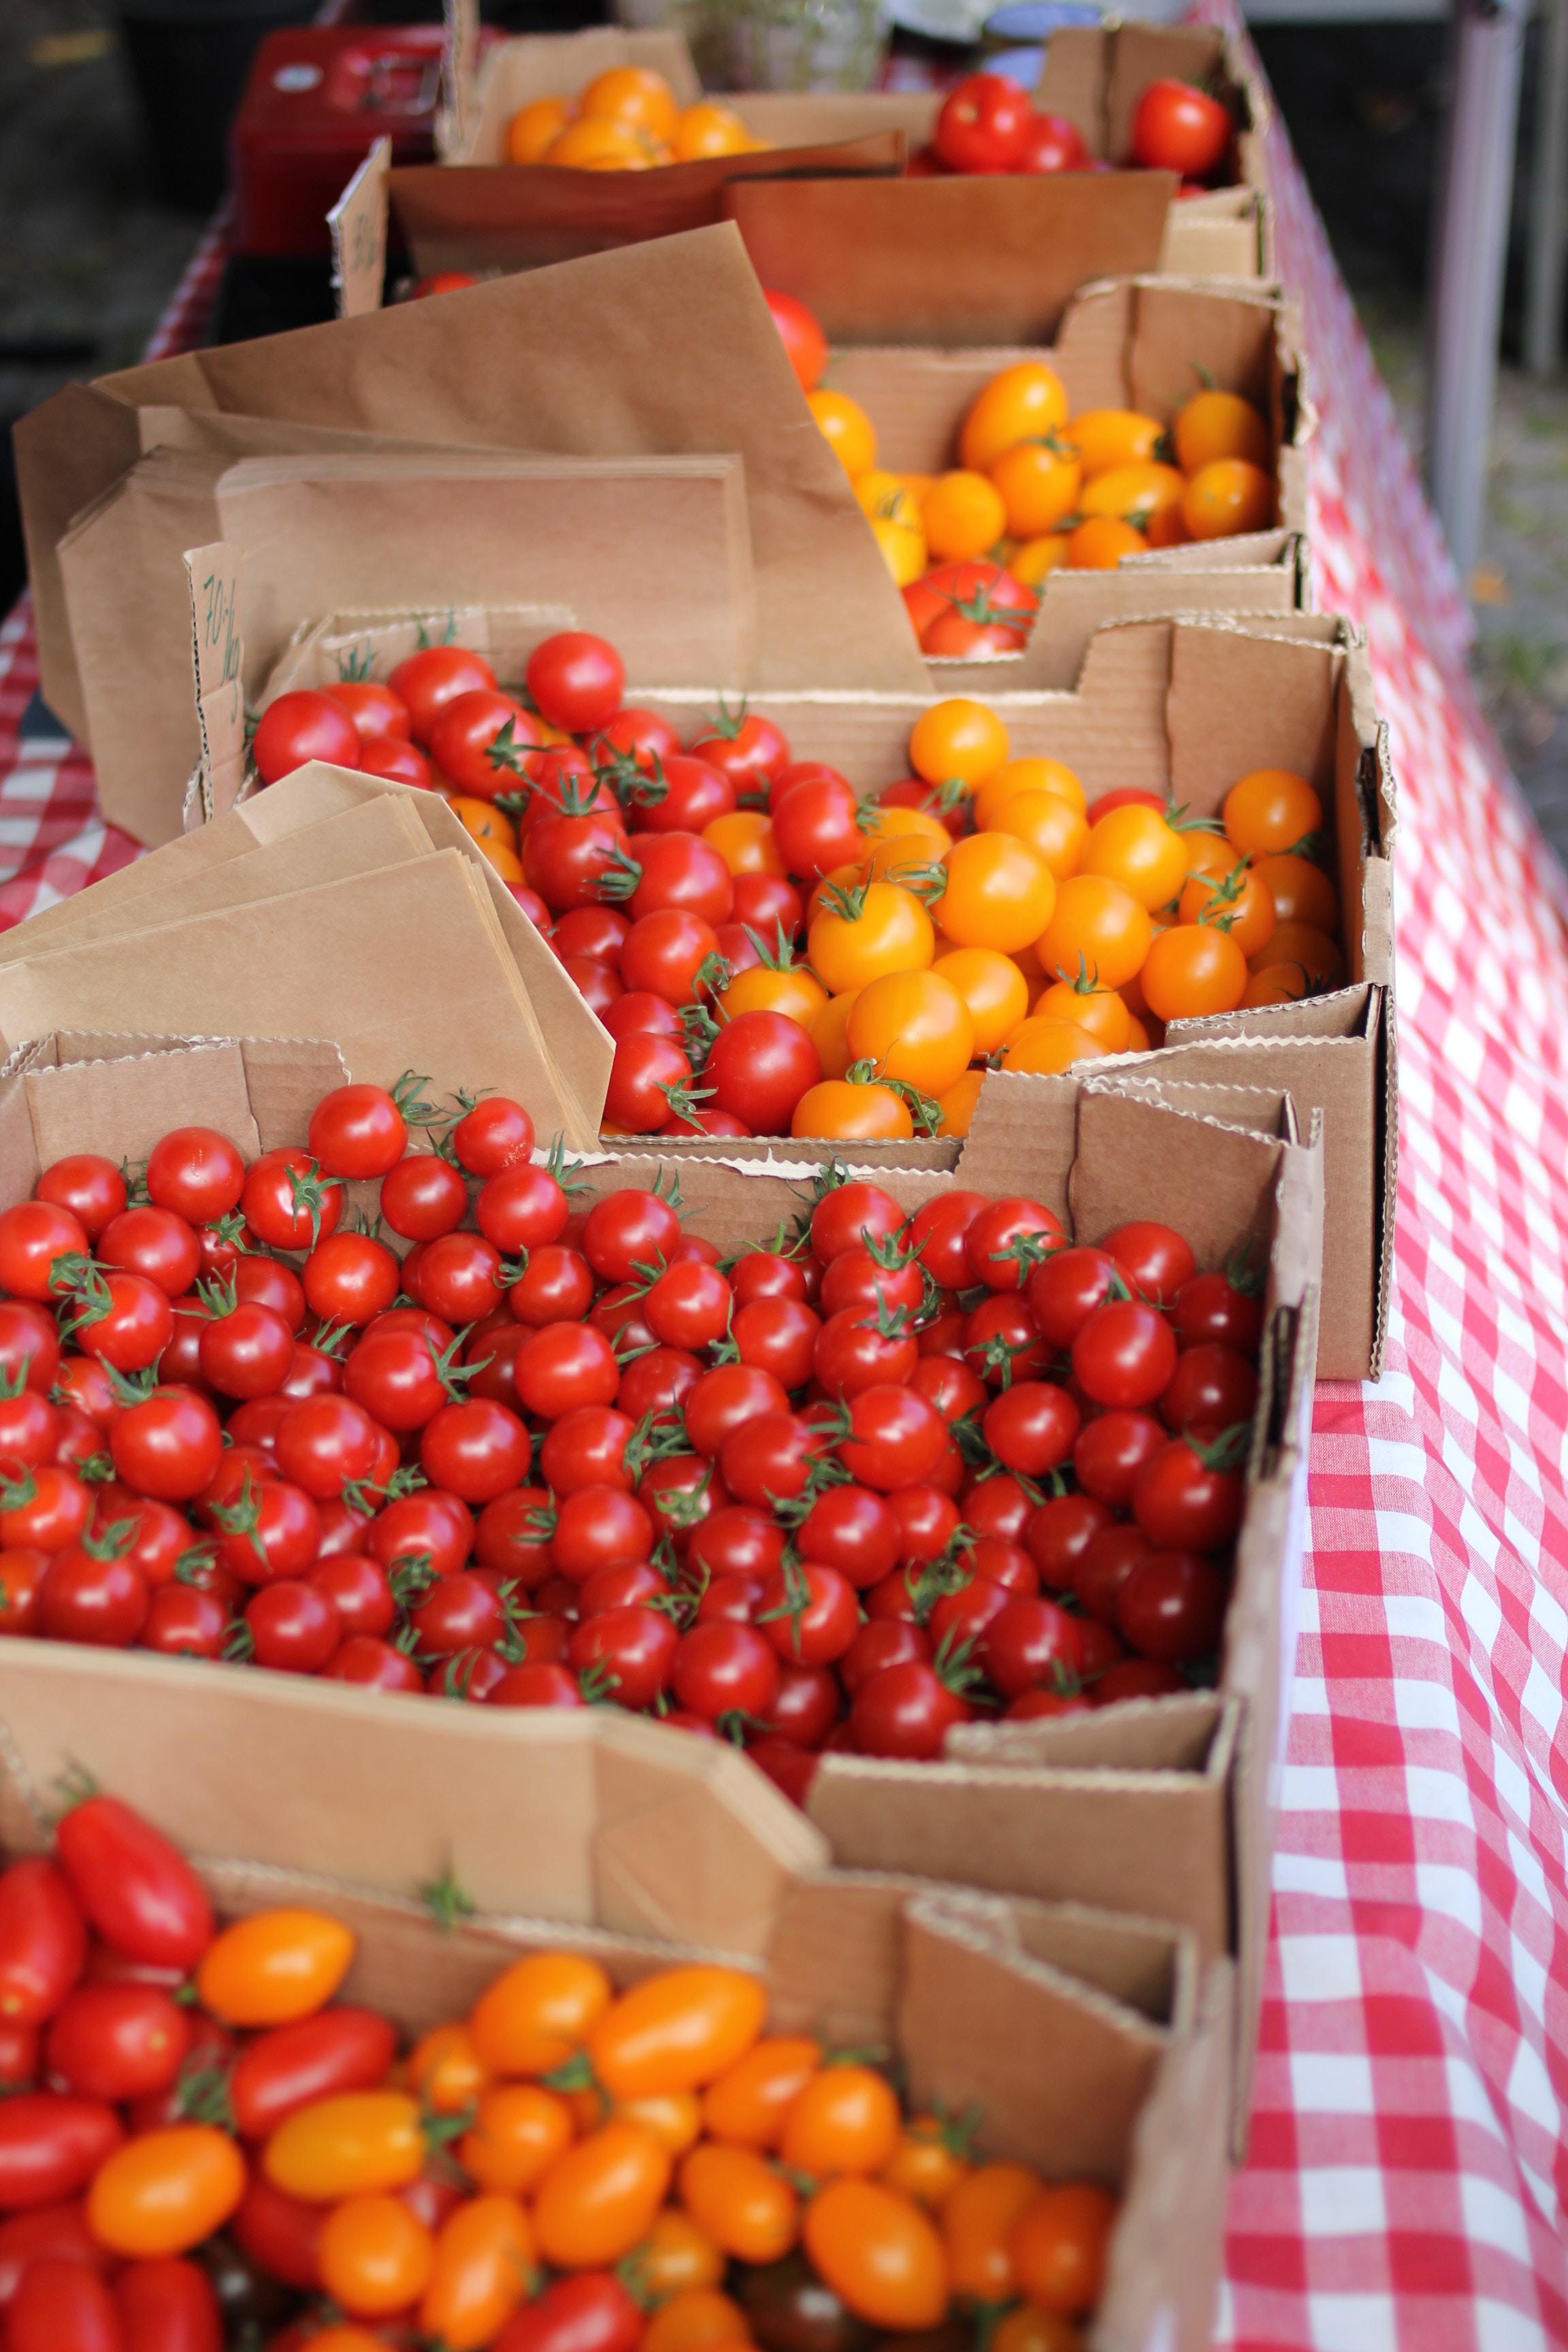 Dieta del tomate (jitomate) para bajar de peso | Me lo